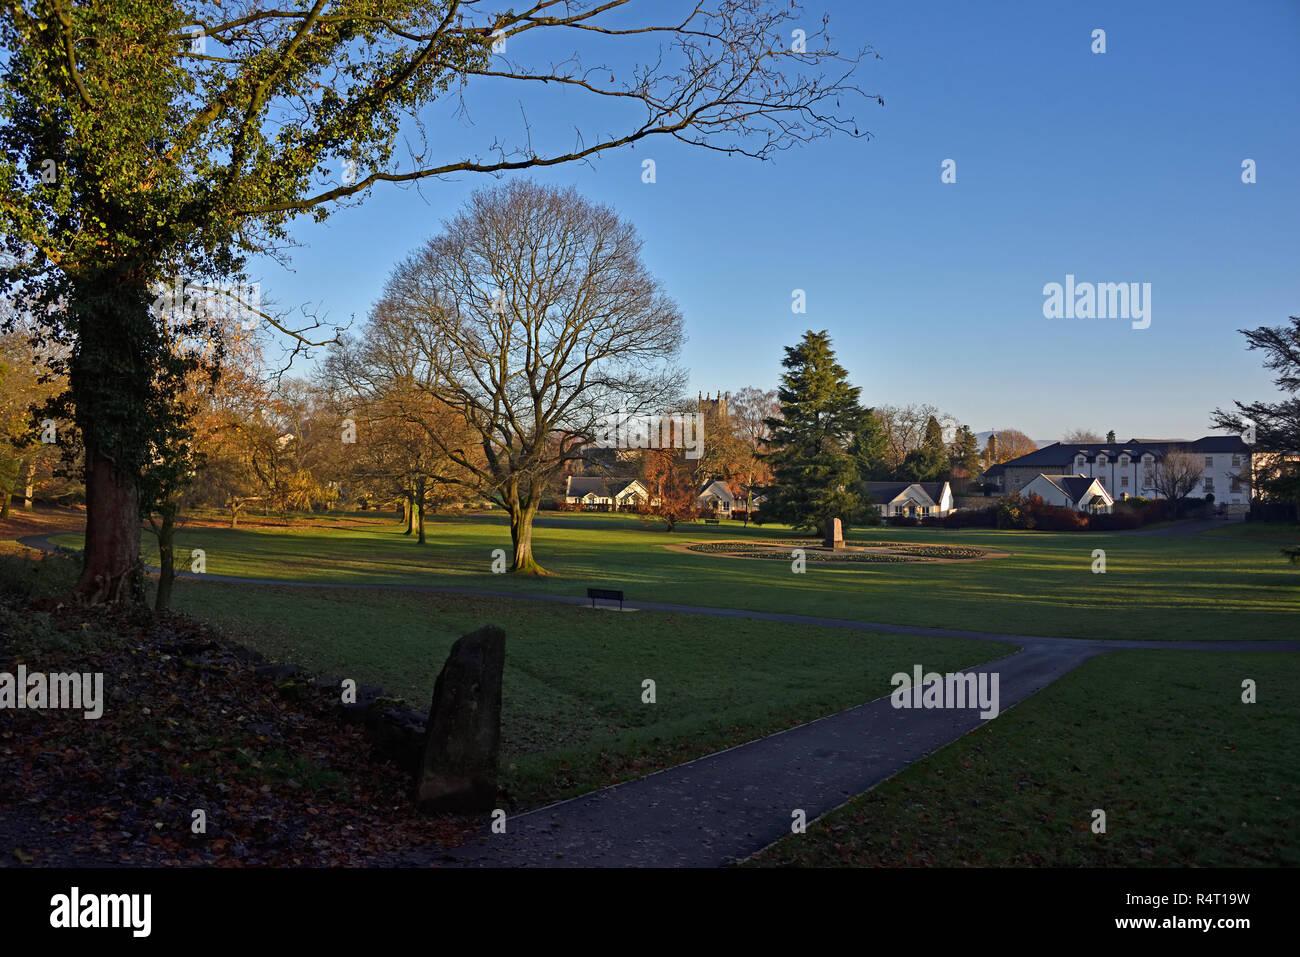 Nobles Rest public park, Kendal, Cumbria, England, United Kingdom, Europe. - Stock Image